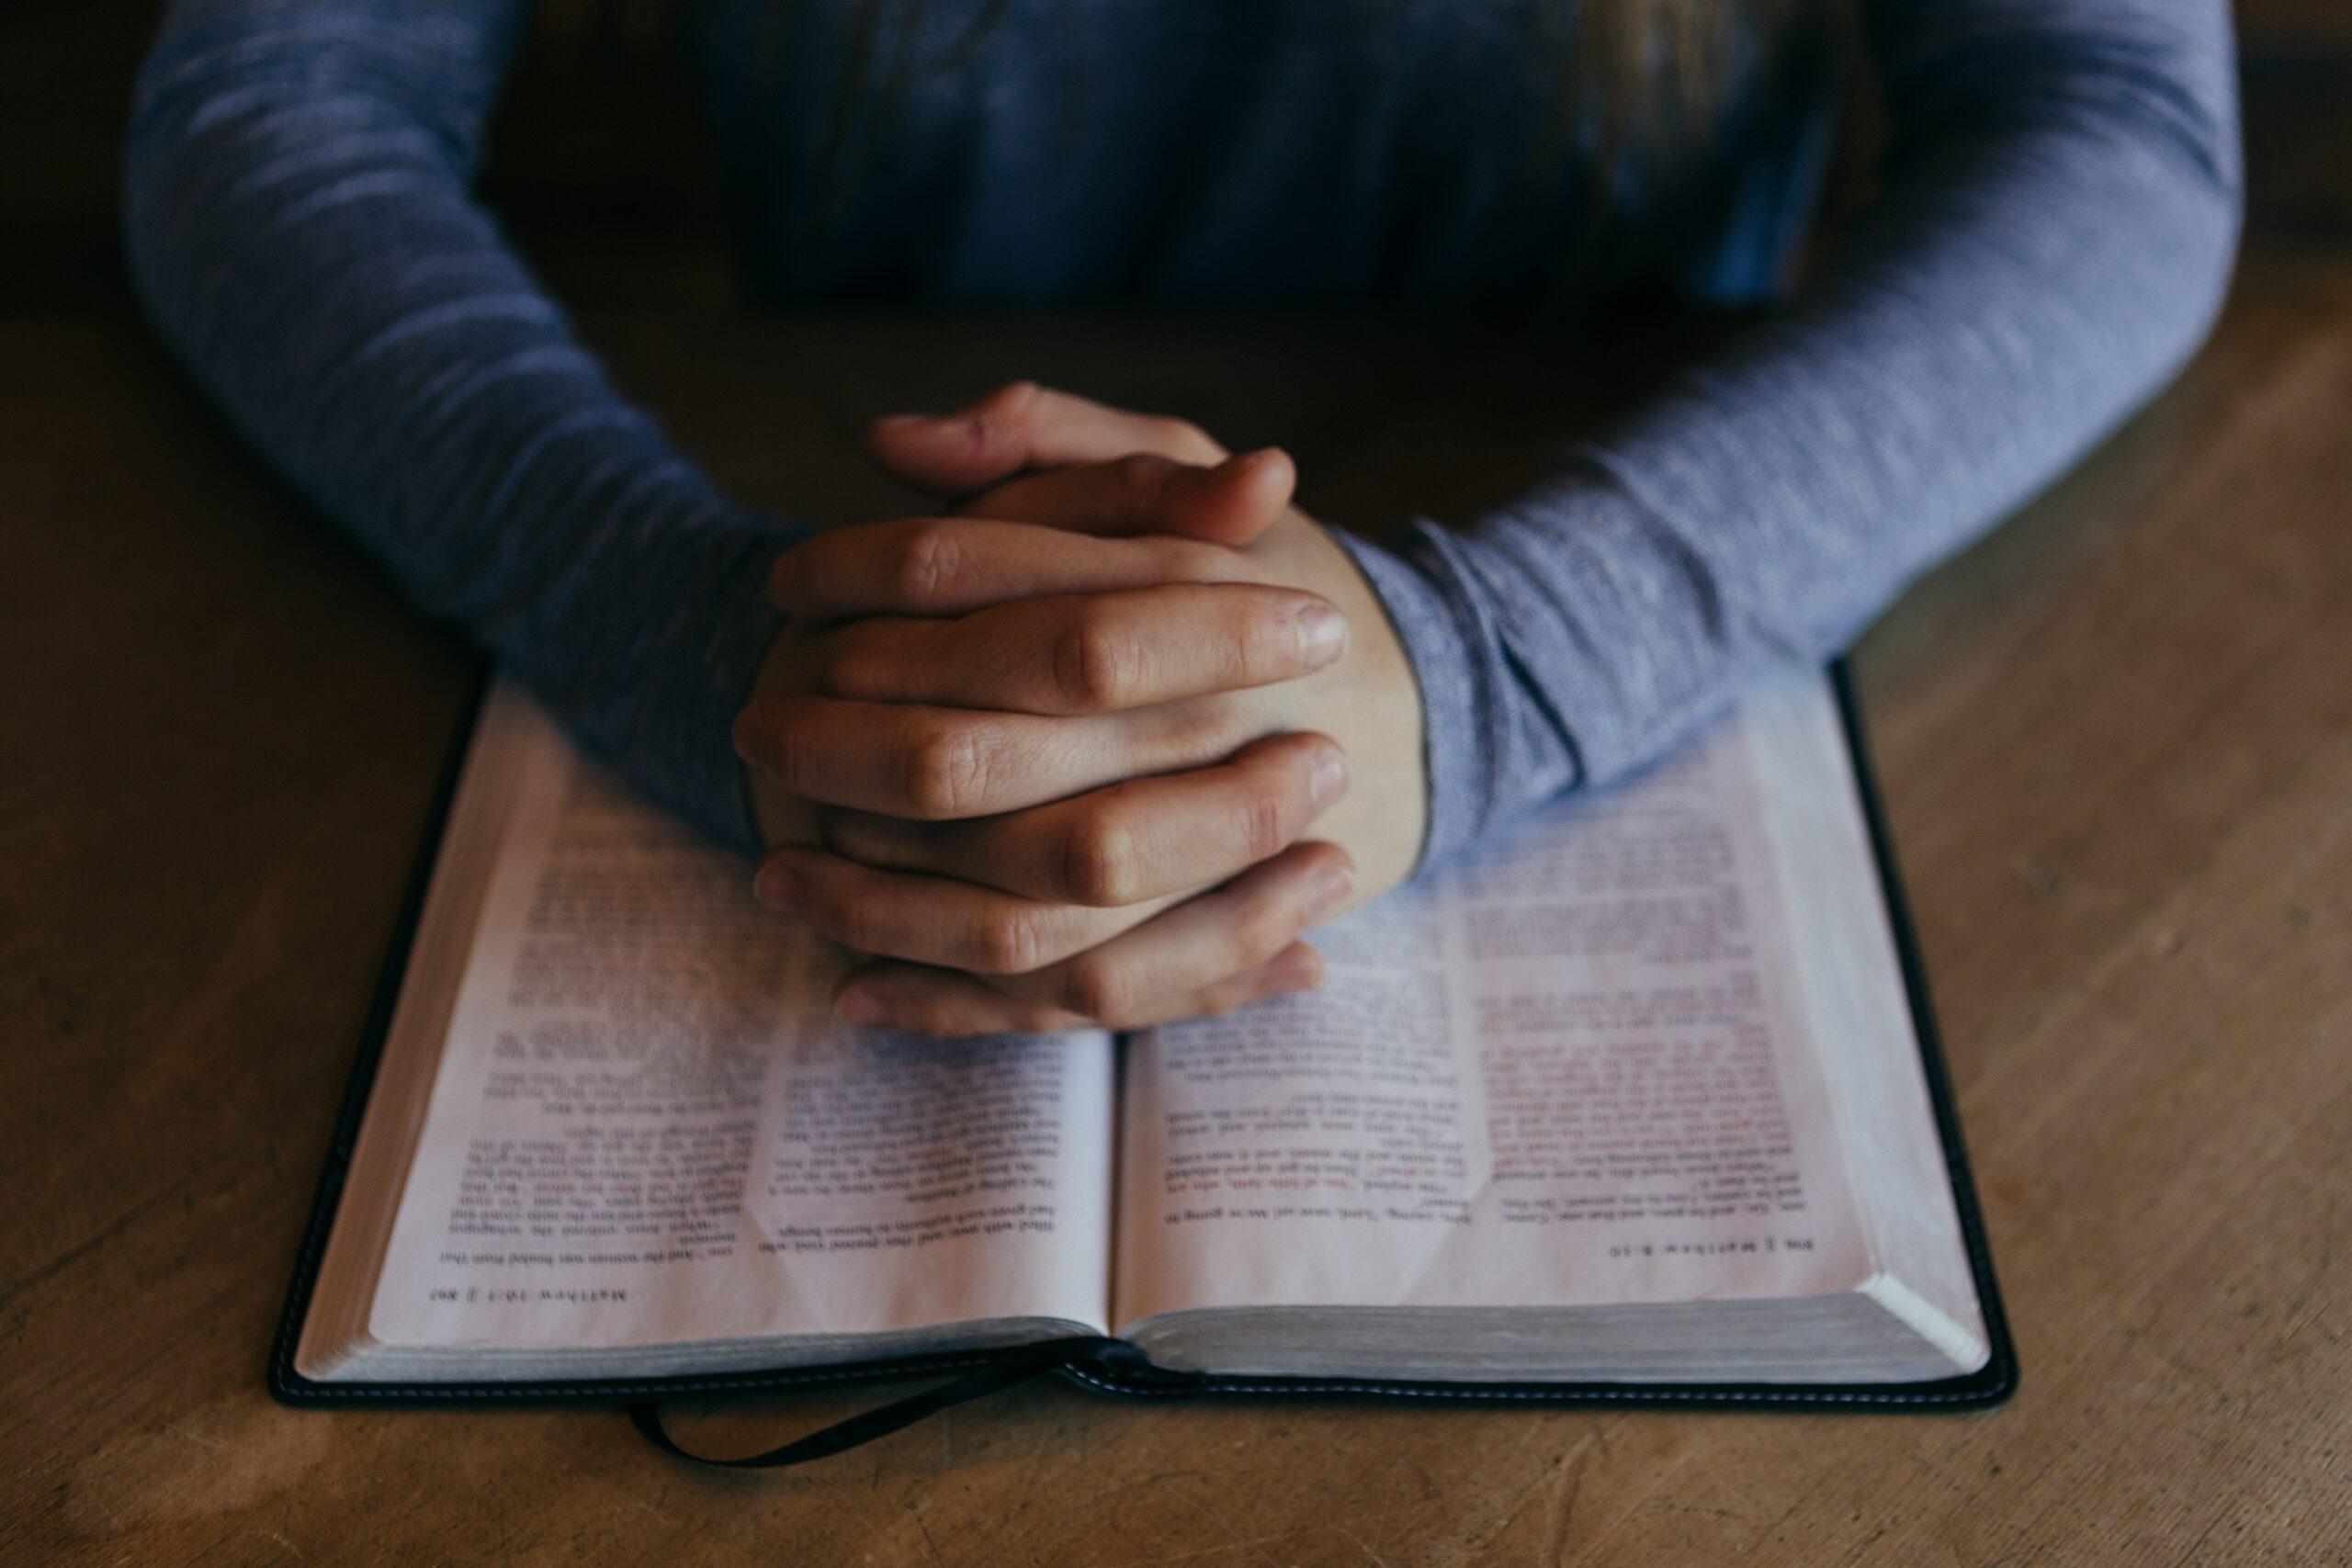 Over-spiritualizing Church